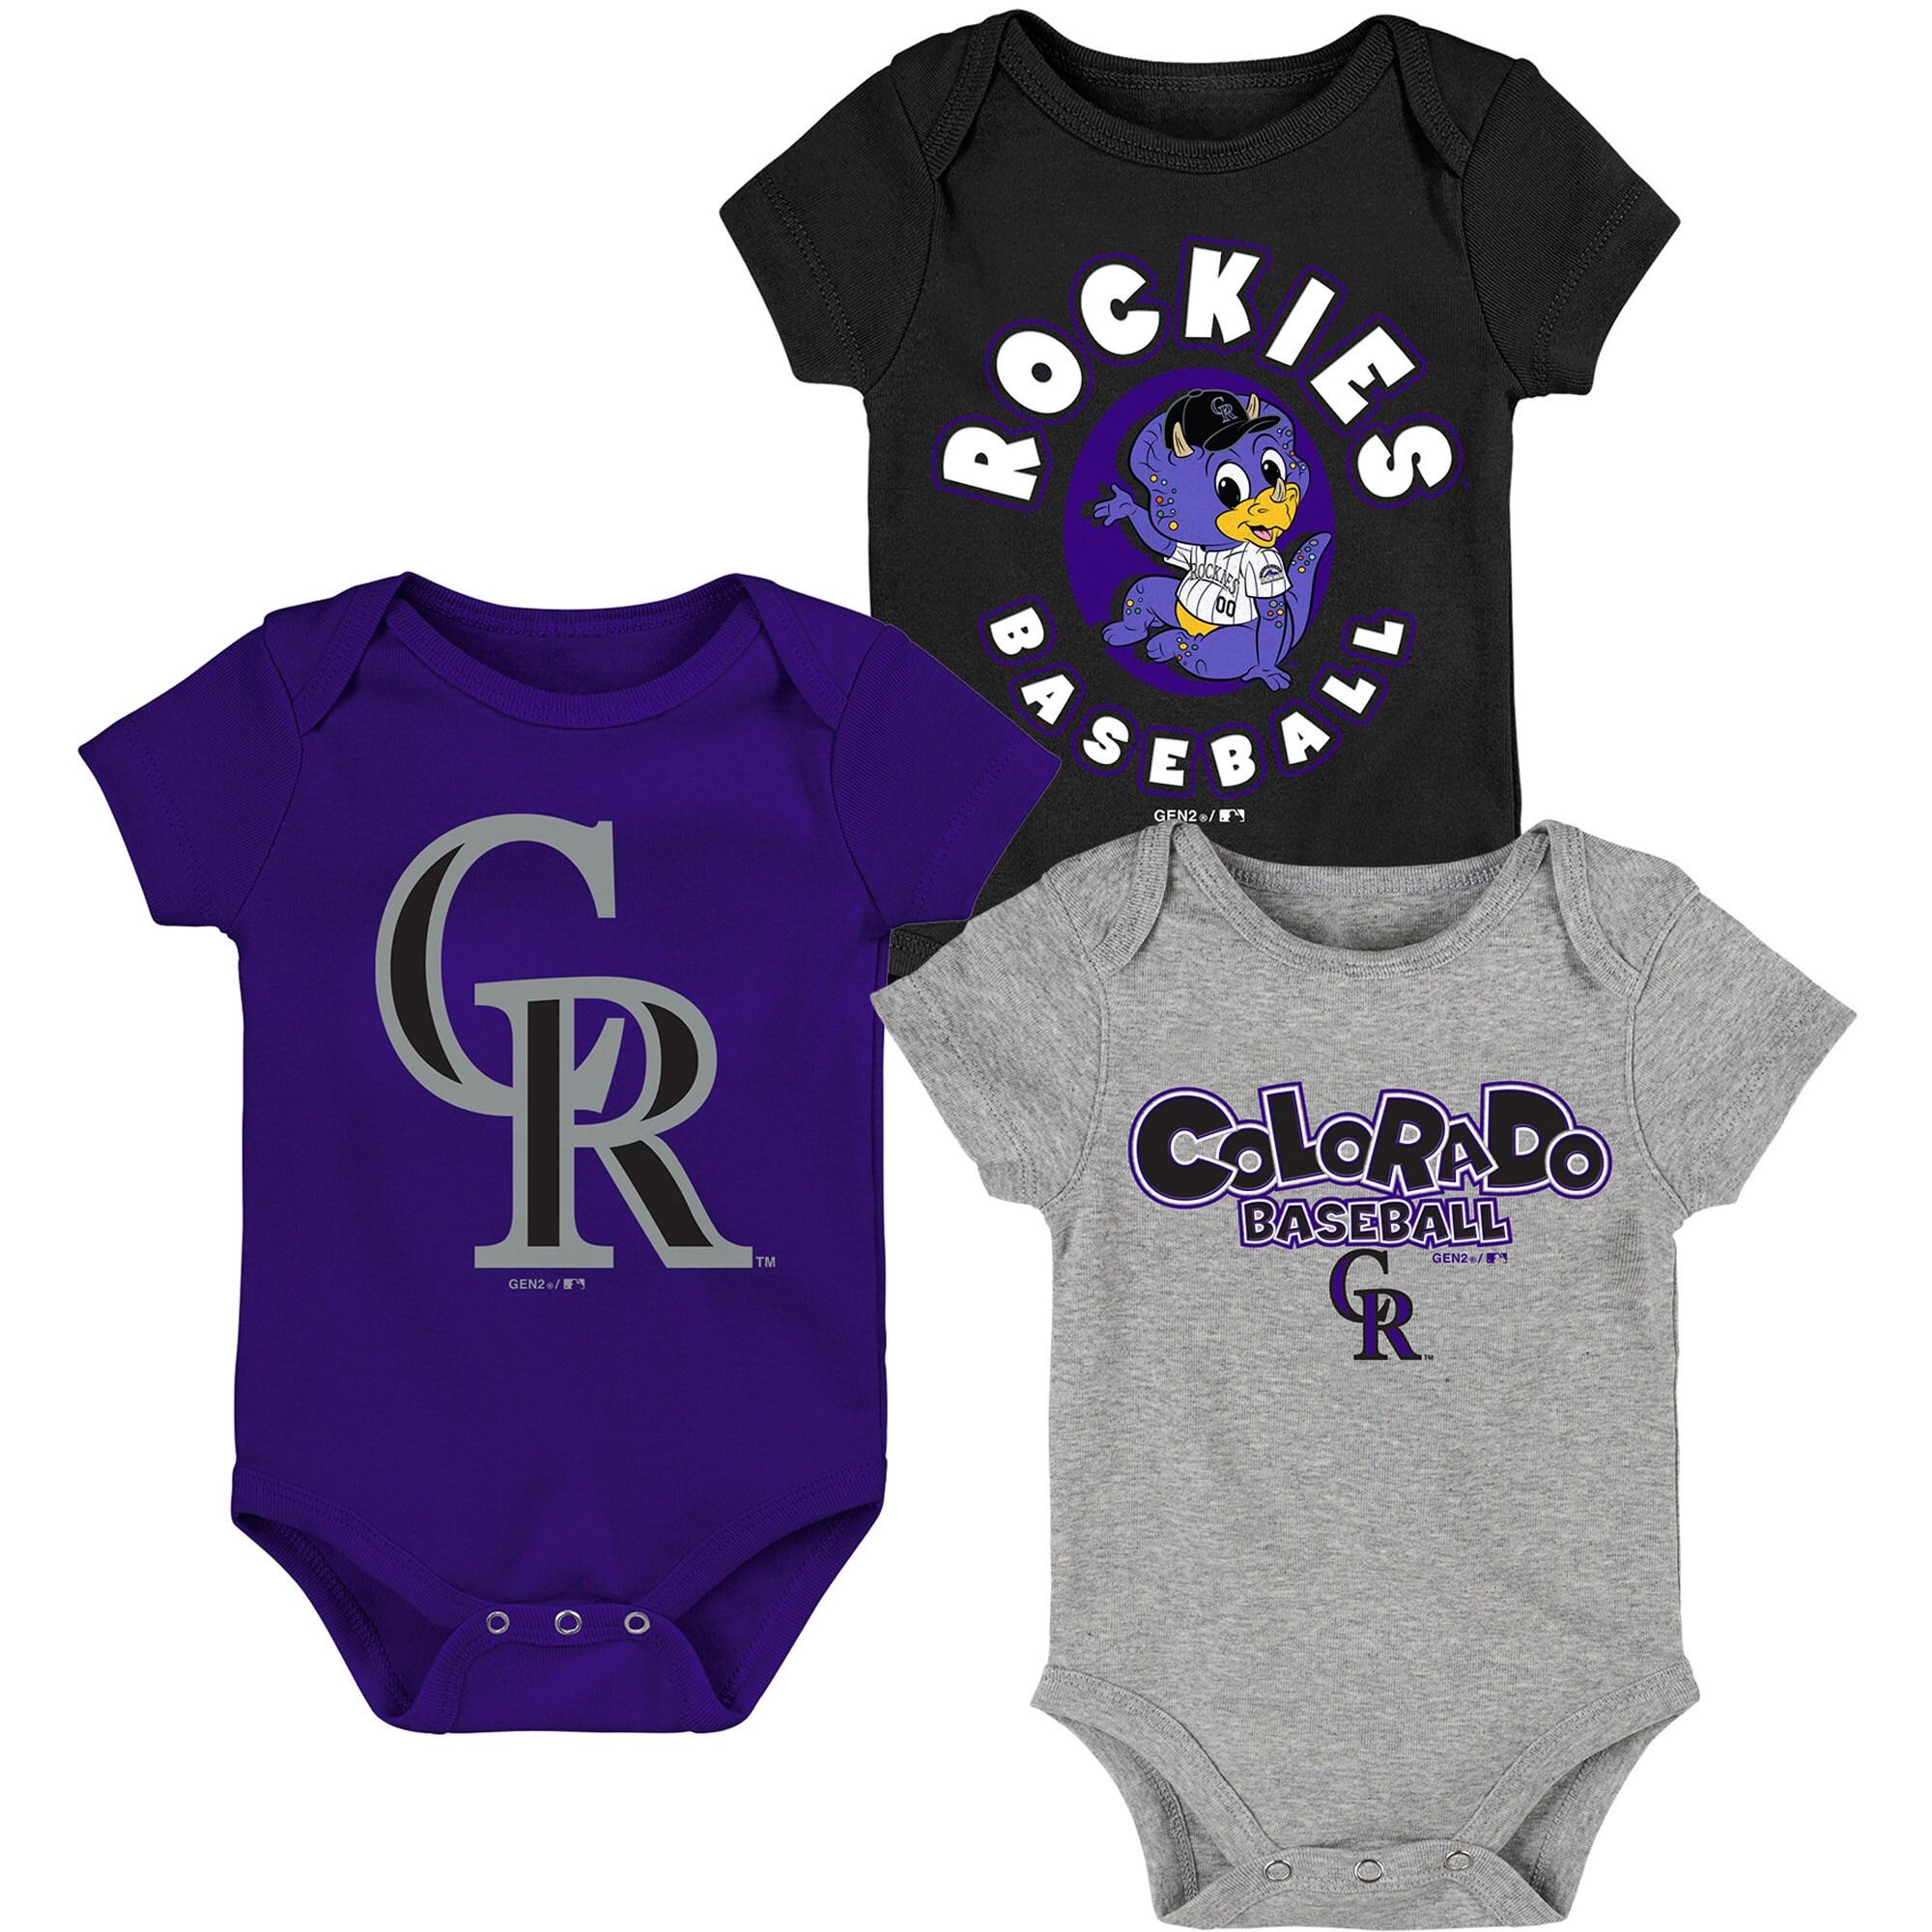 Colorado Rockies Infant Everyday Fan Three-Pack Bodysuit Set - Black/Purple/Gray